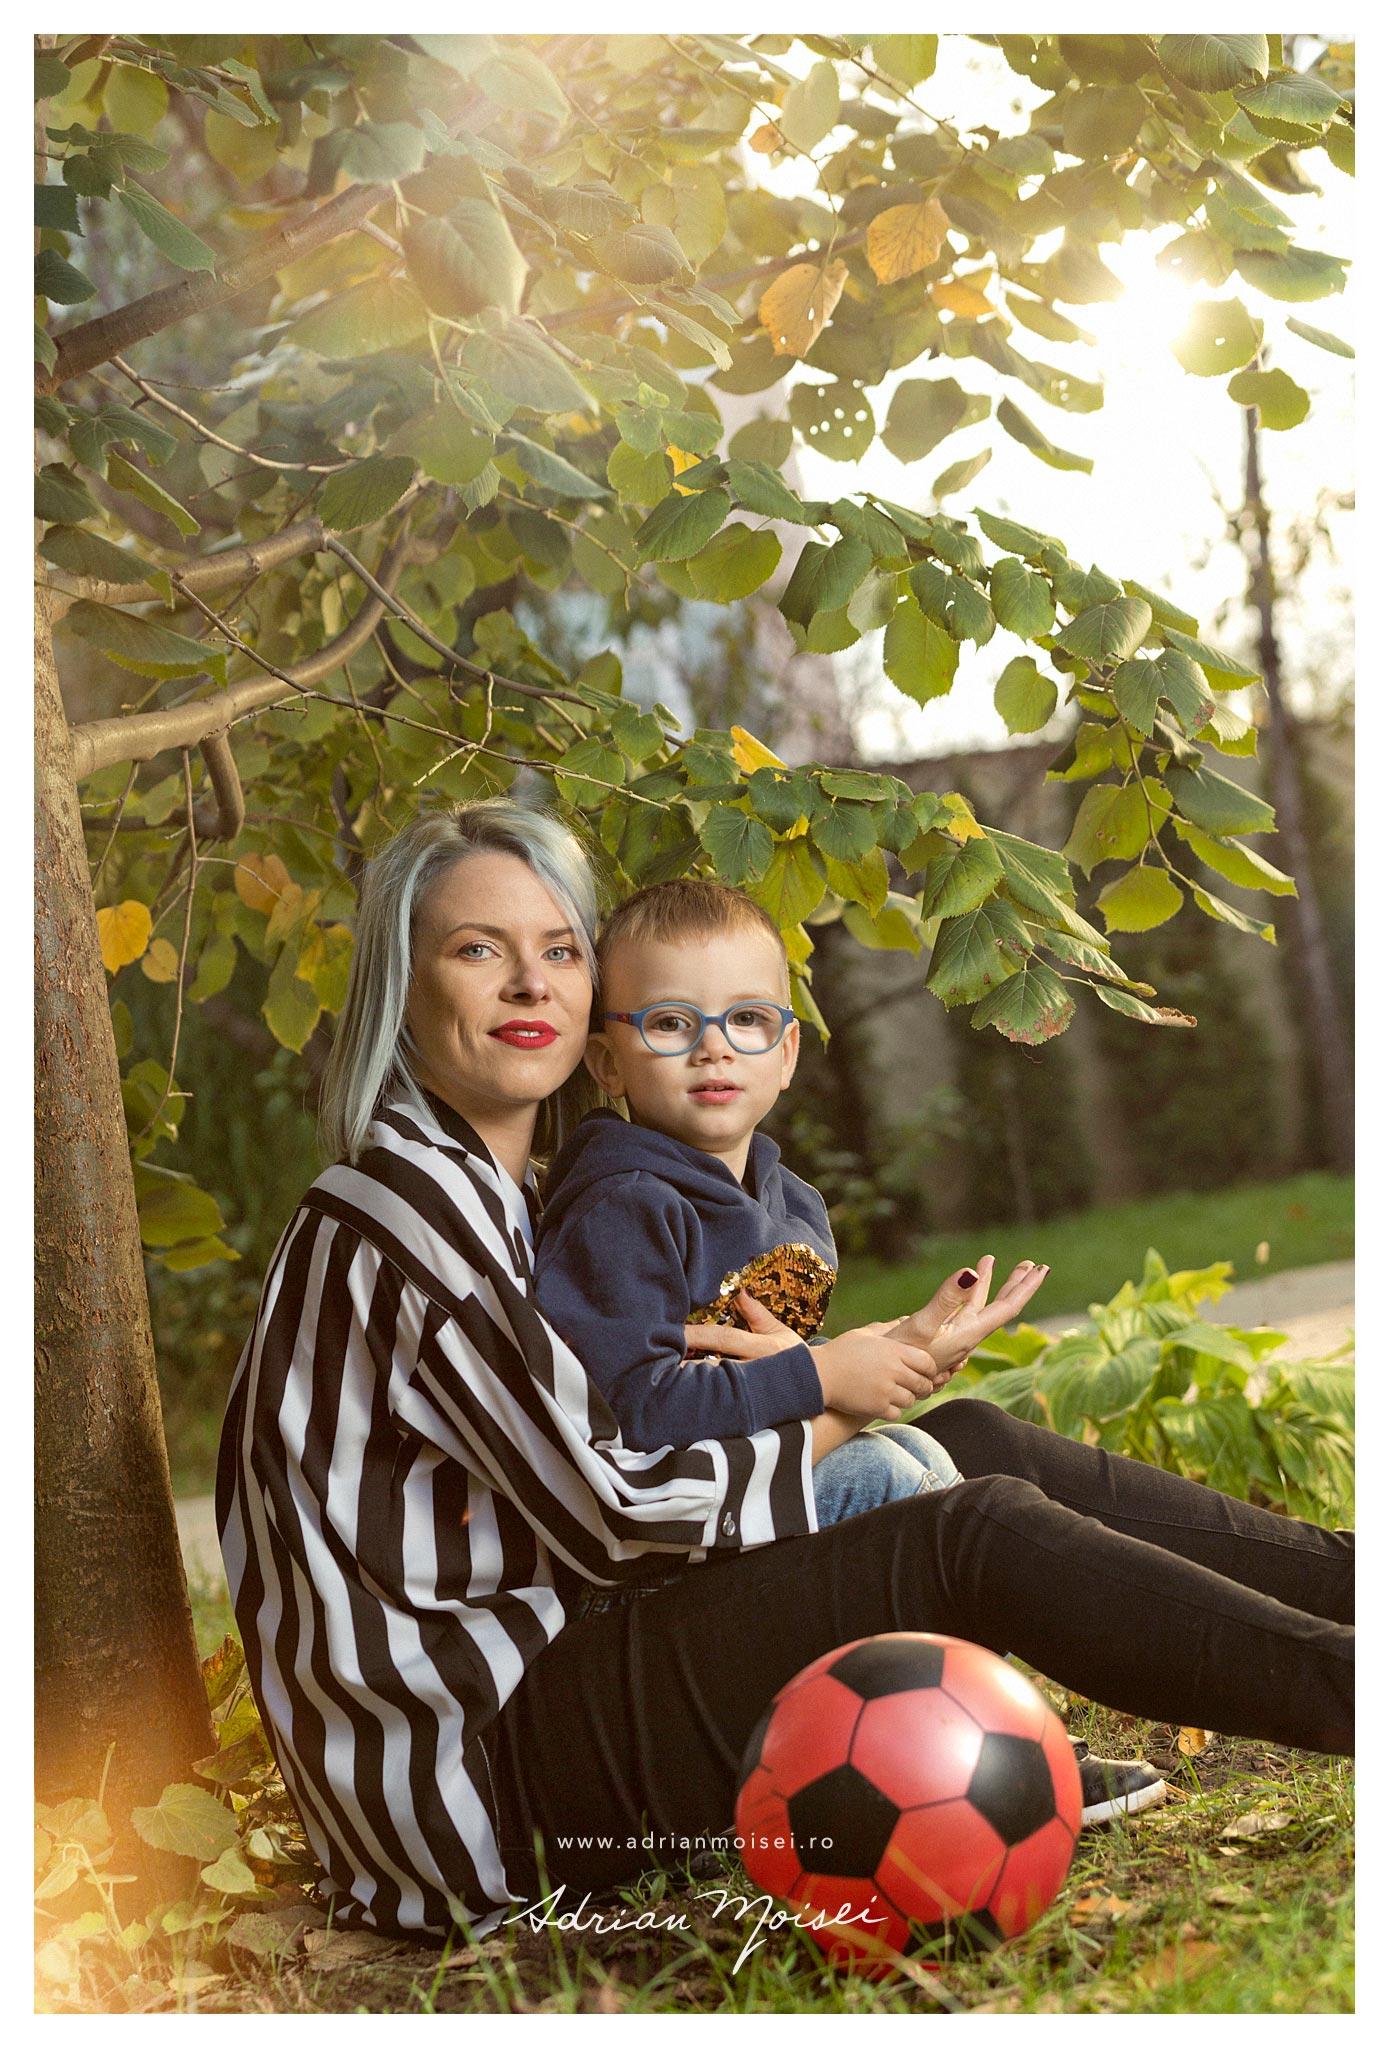 Fotograf profesionist de familie, bebelusi si copii in Iasi, Adrian Moisei